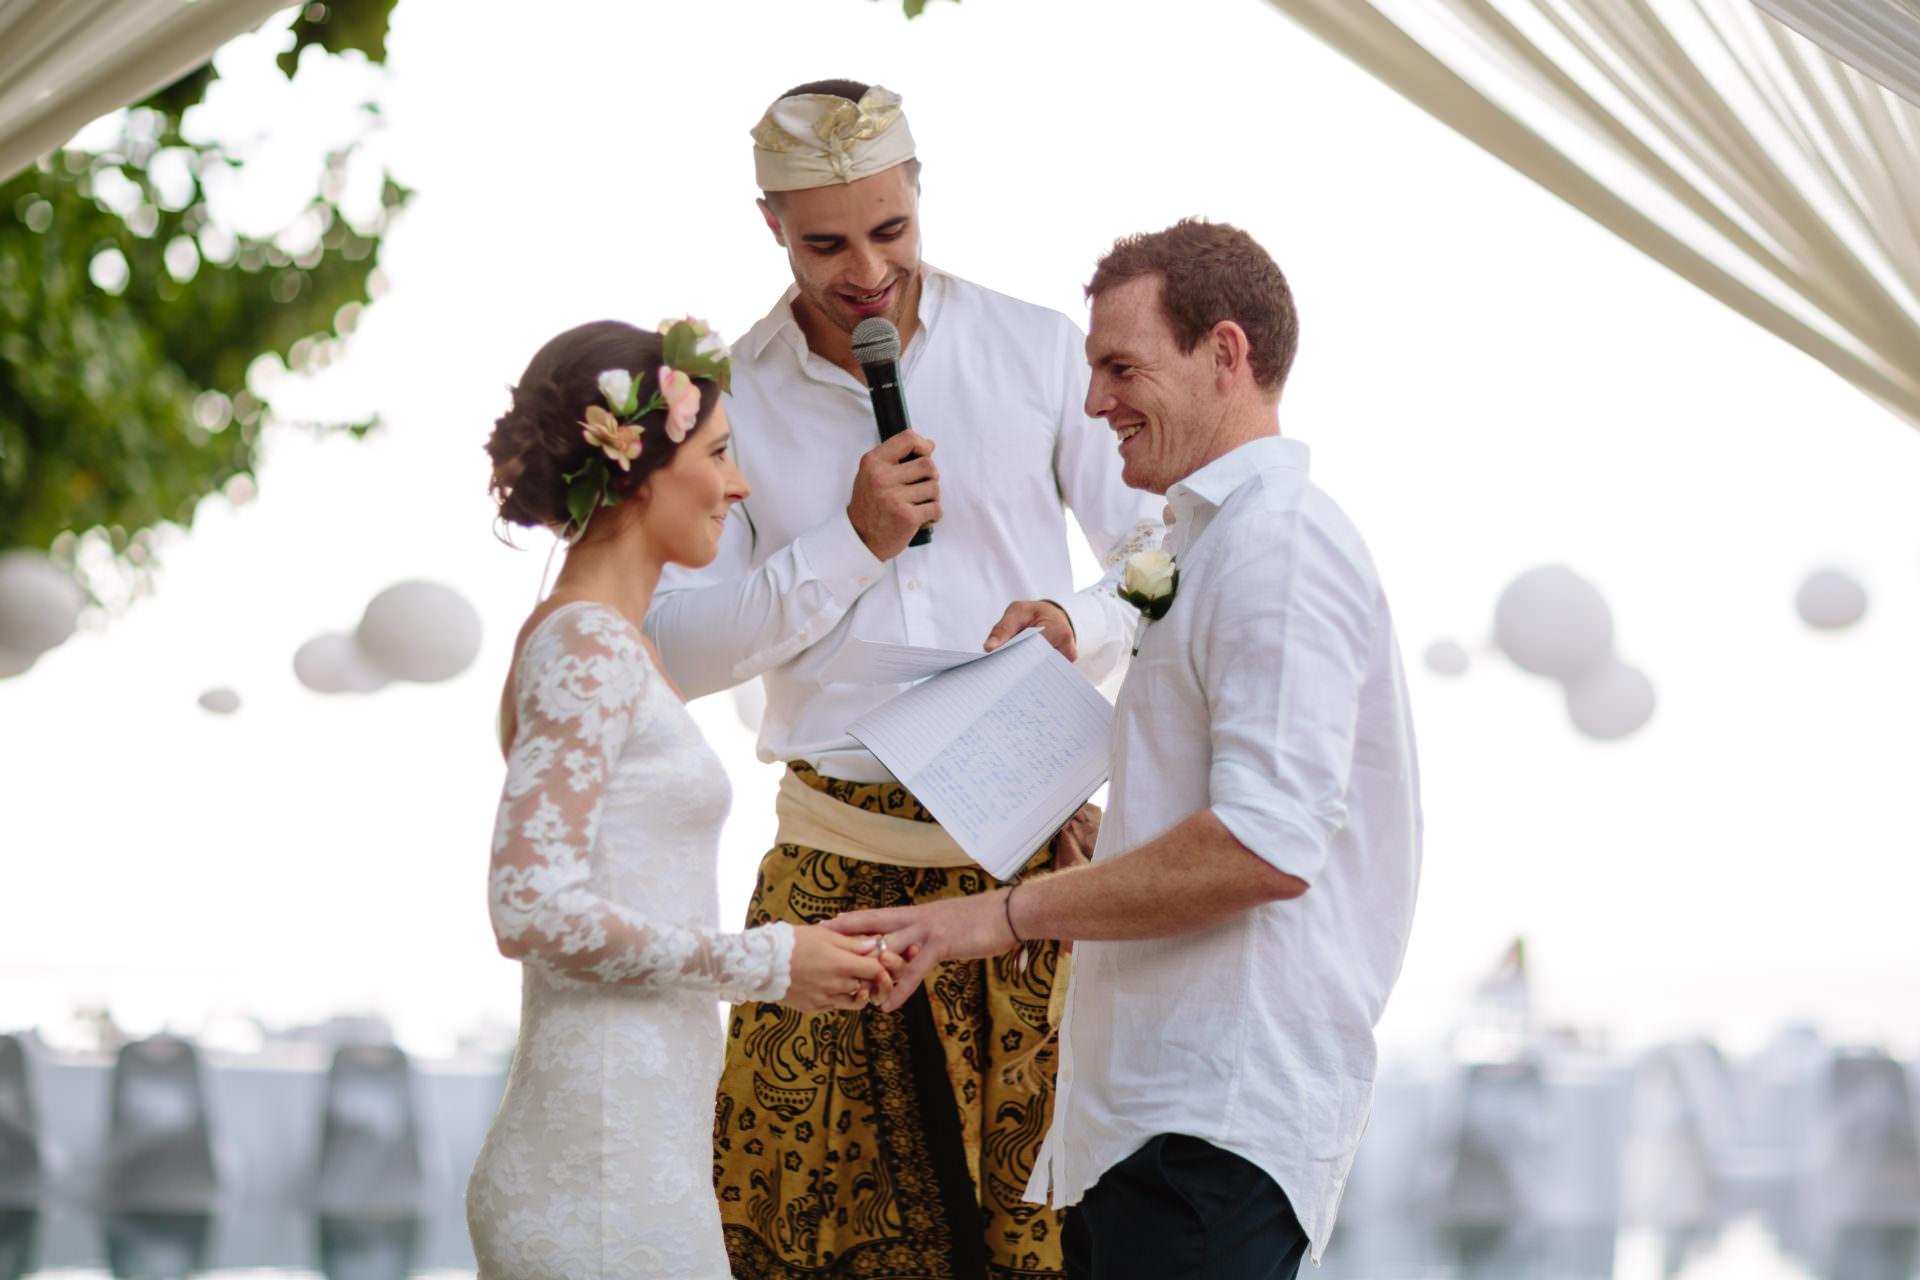 marc-megan-wedding-bali-the-official-photographers_TOP_0665